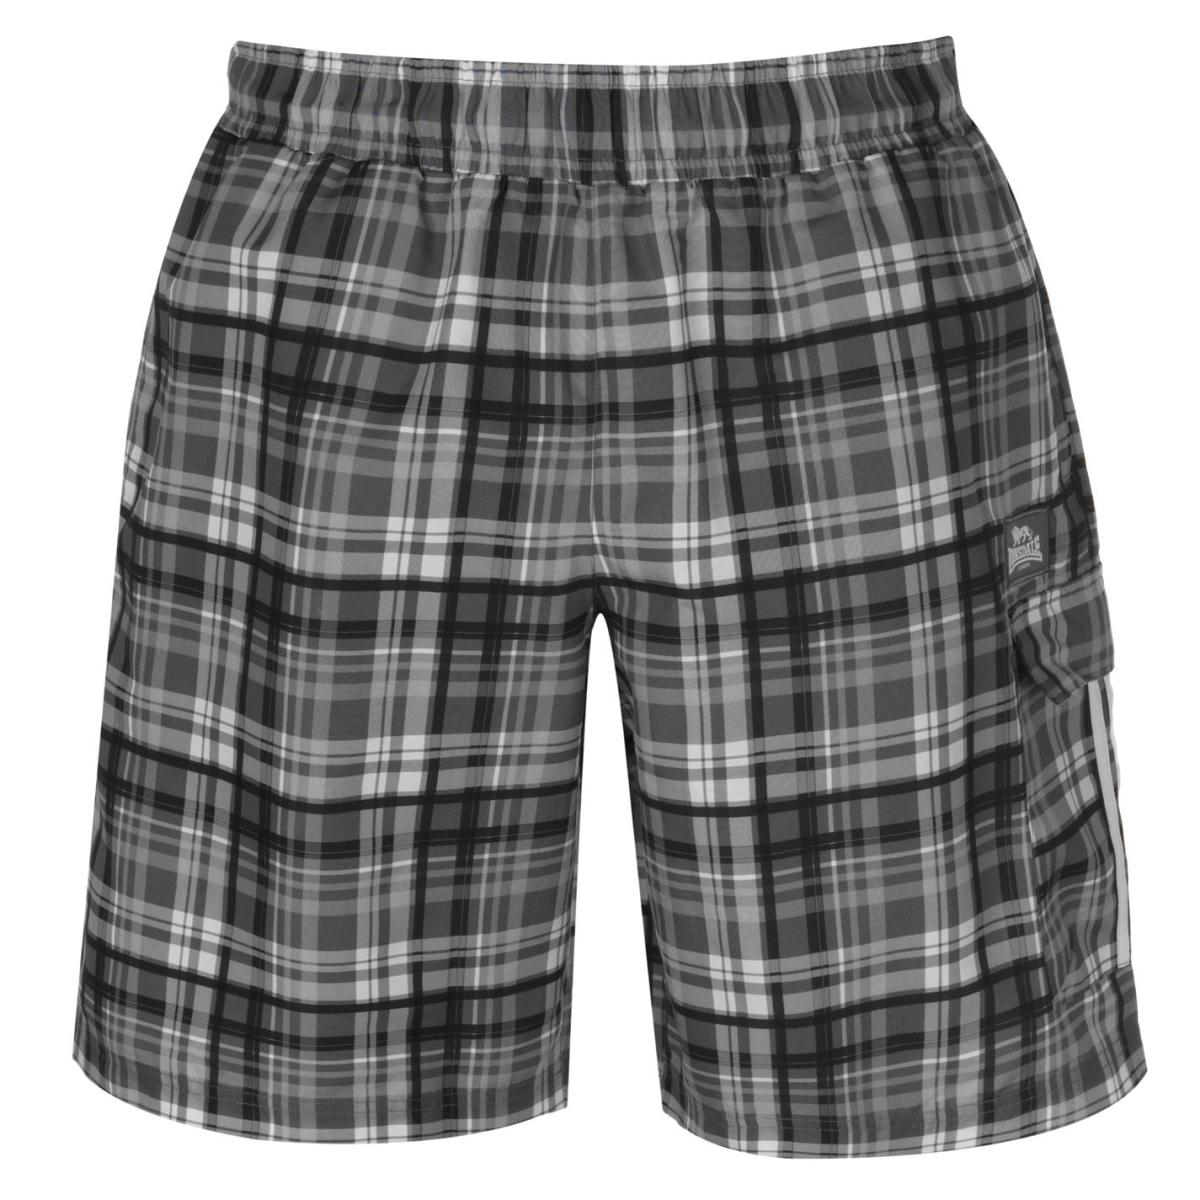 Lonsdale Herren Shorts Sporthose Kurzhose Bermuda Sport Hose 2064